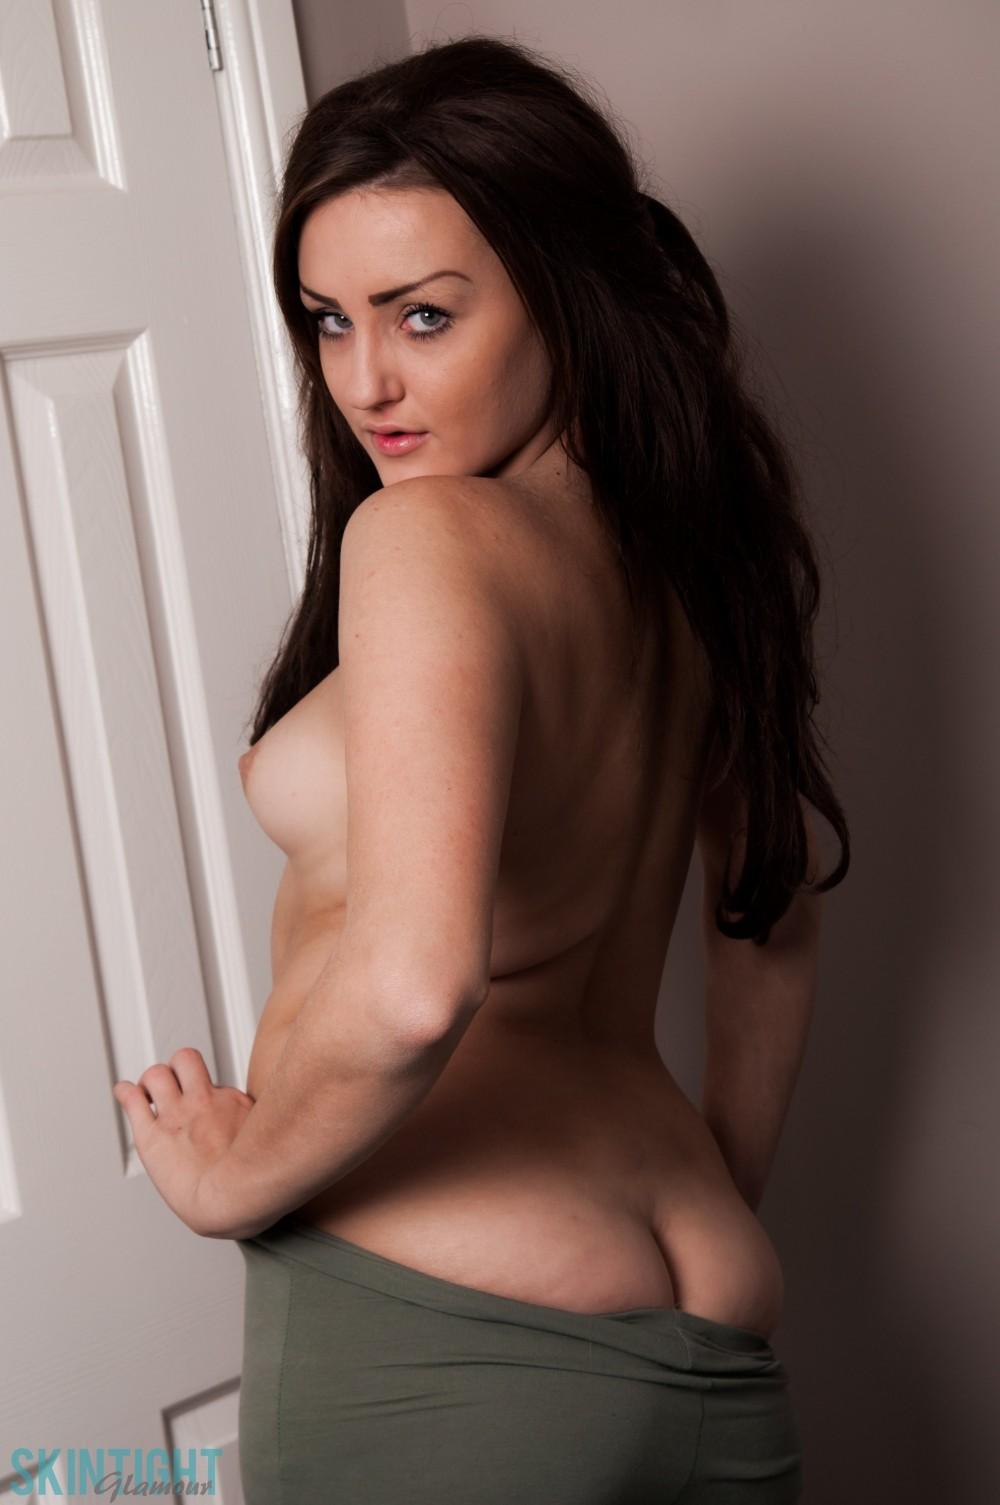 Katie smith nude